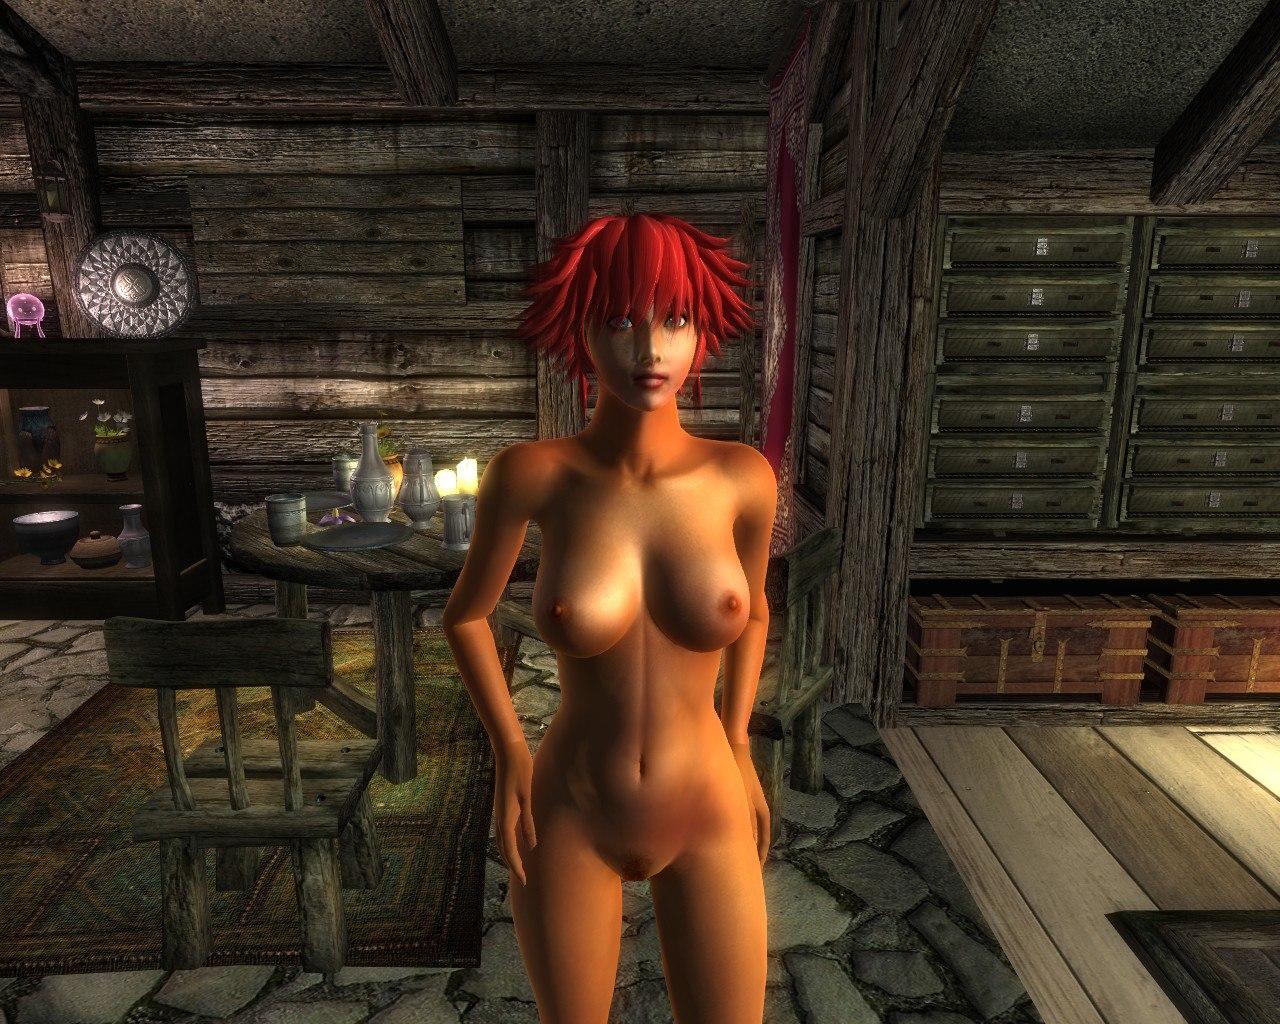 Oblivion eye candy nude mod smut wifes